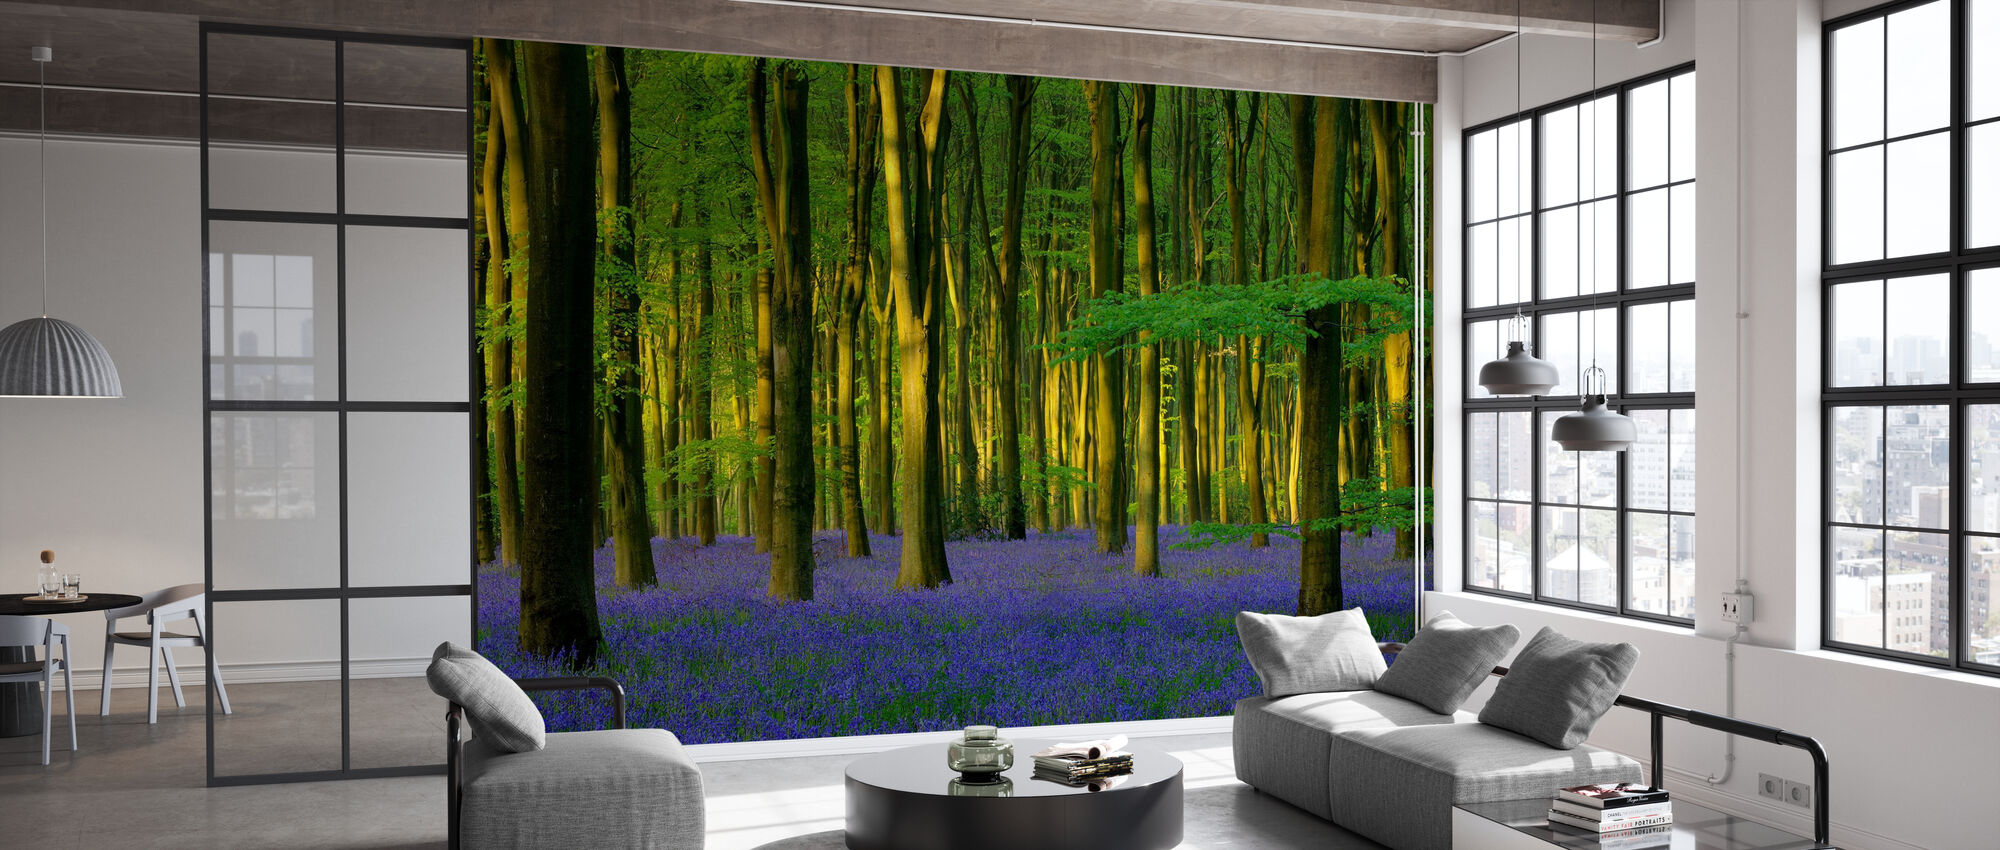 Bluebells in Sunlight - Wallpaper - Office